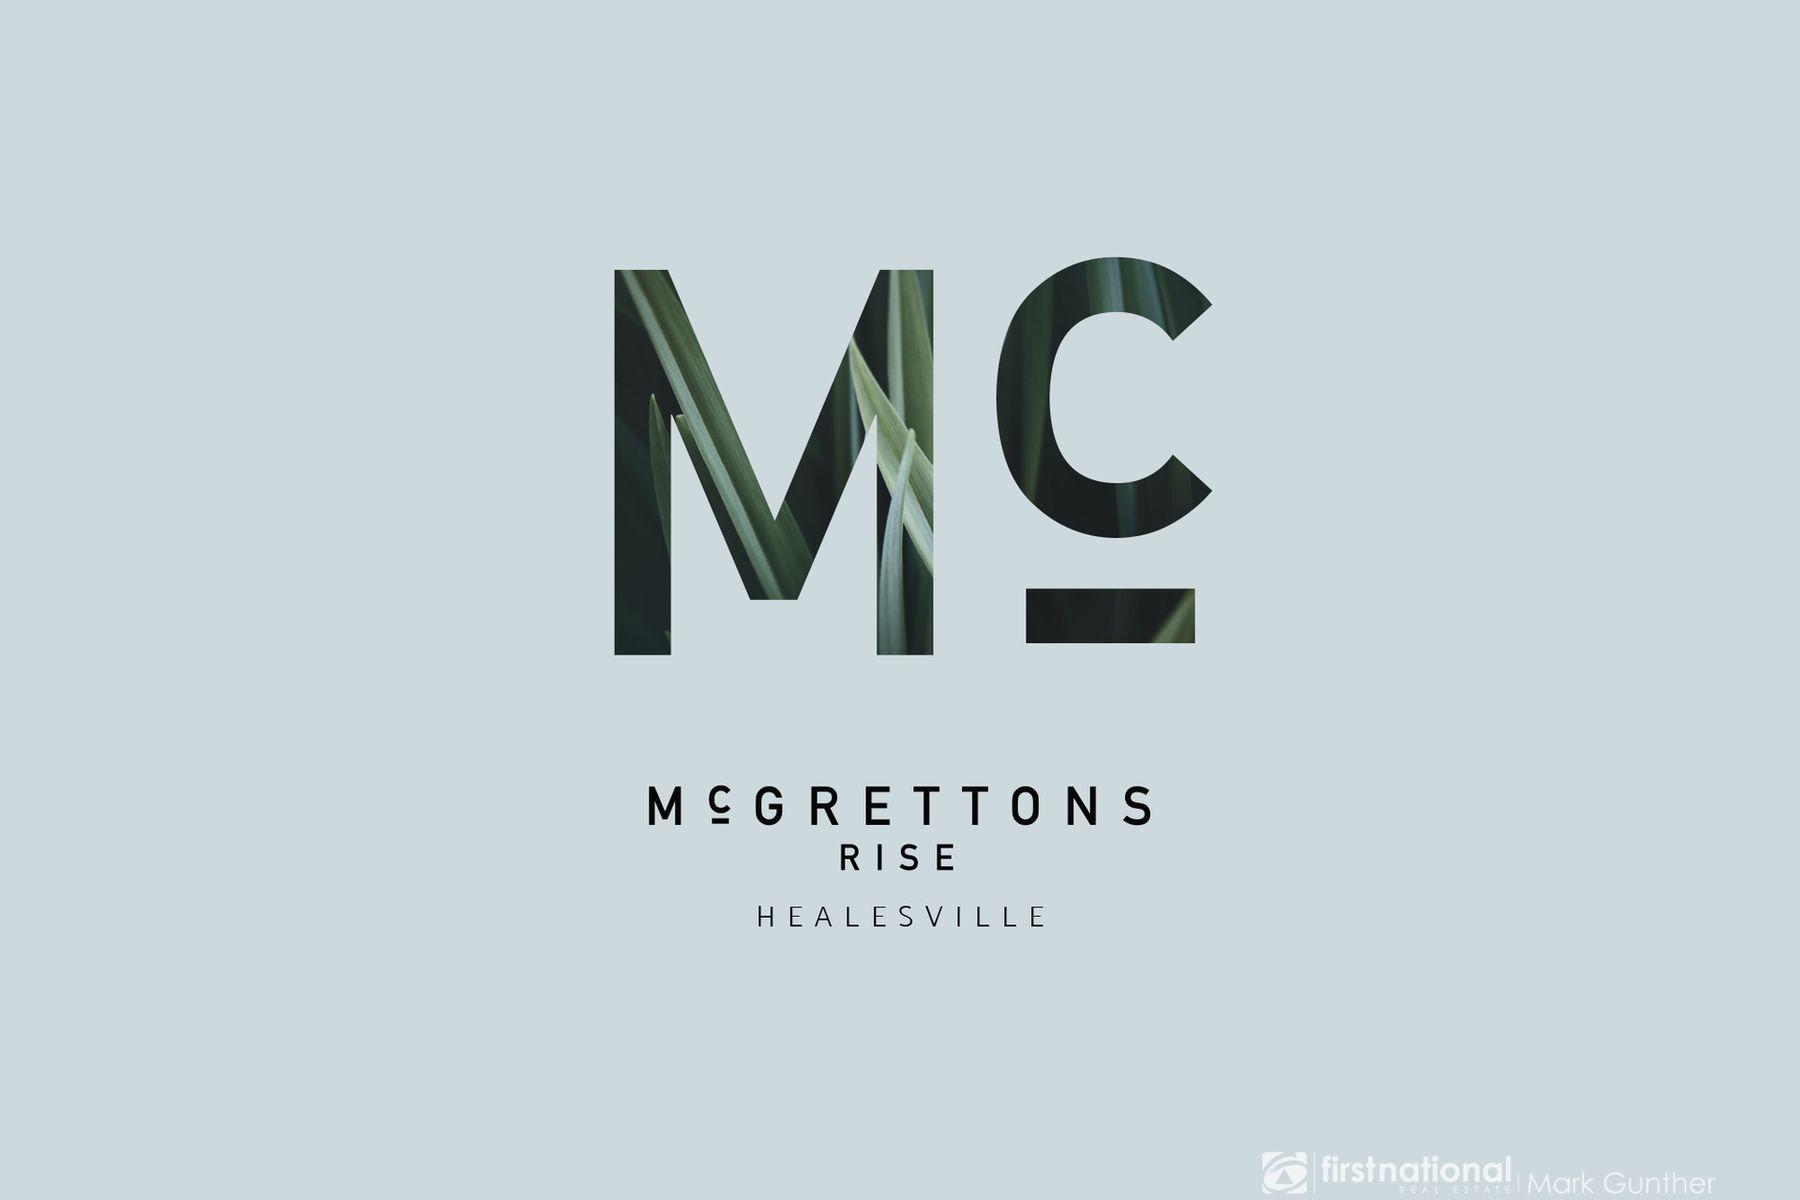 Lot 6/29 Mcgrettons Road, Healesville, VIC 3777